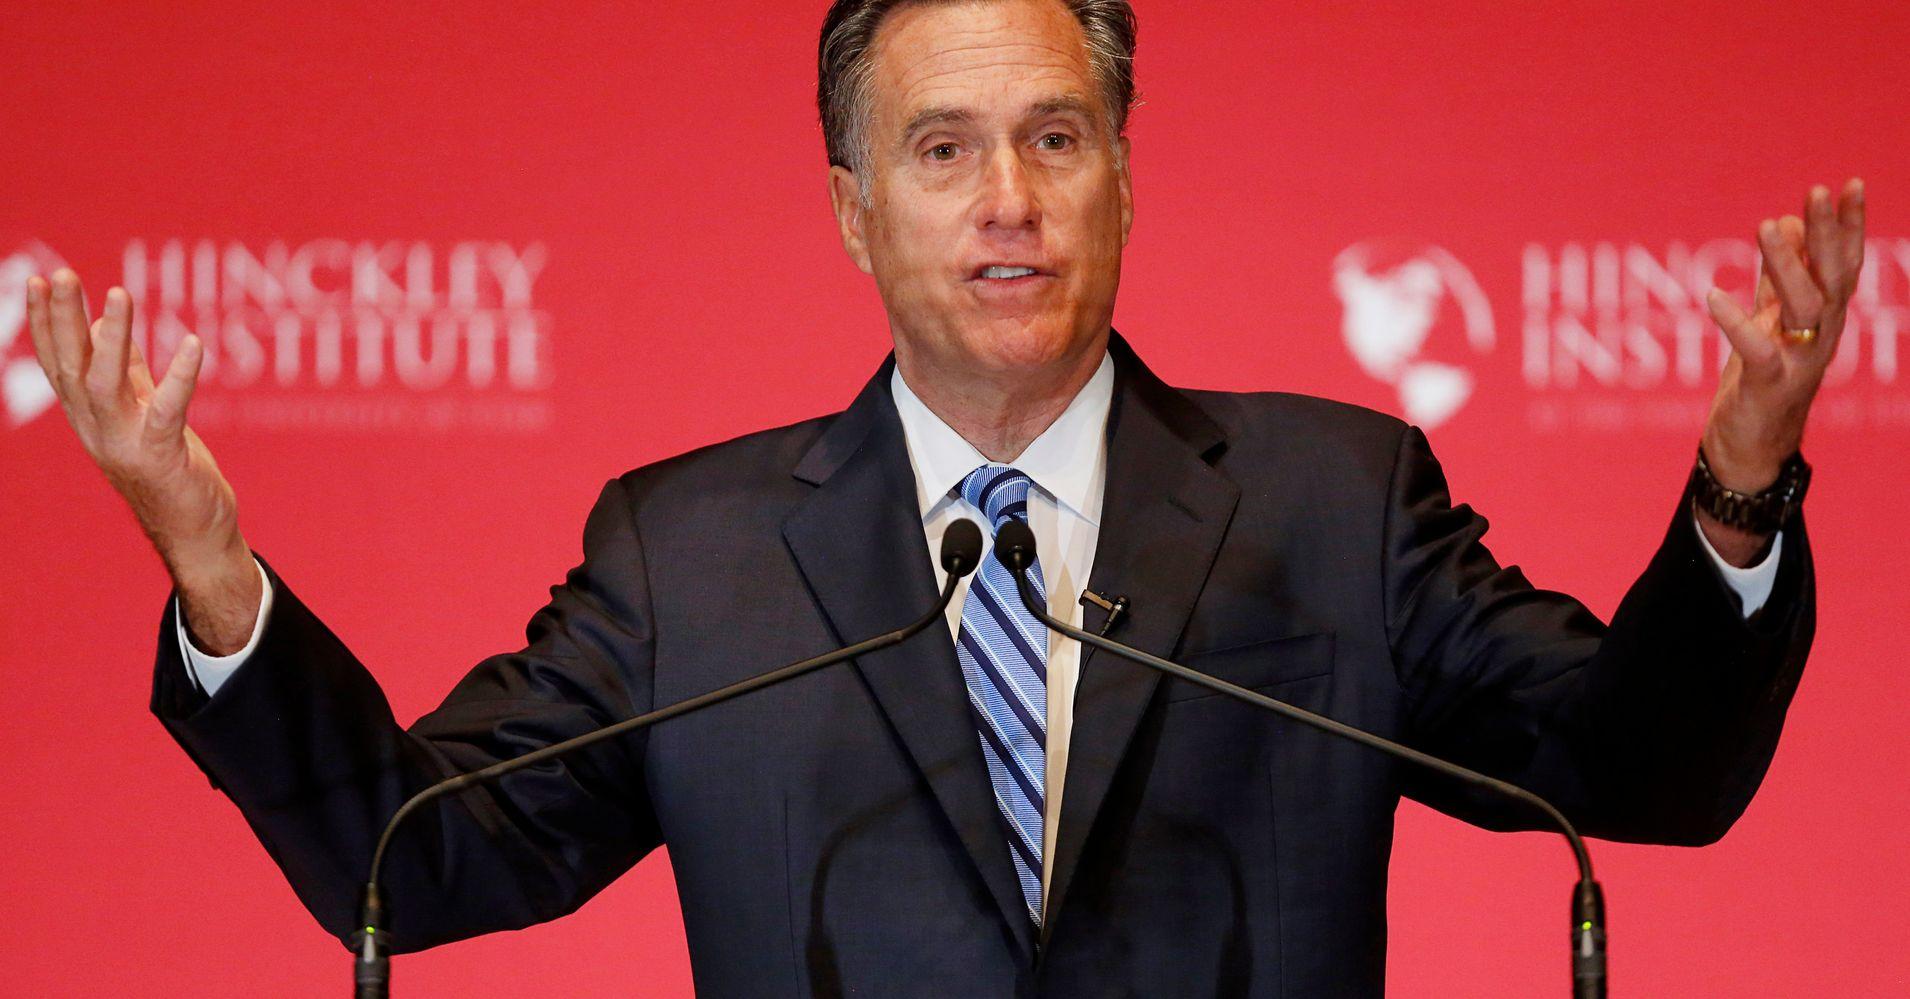 Kanye West Raps About Mitt Romney's Tax Return - YouTube